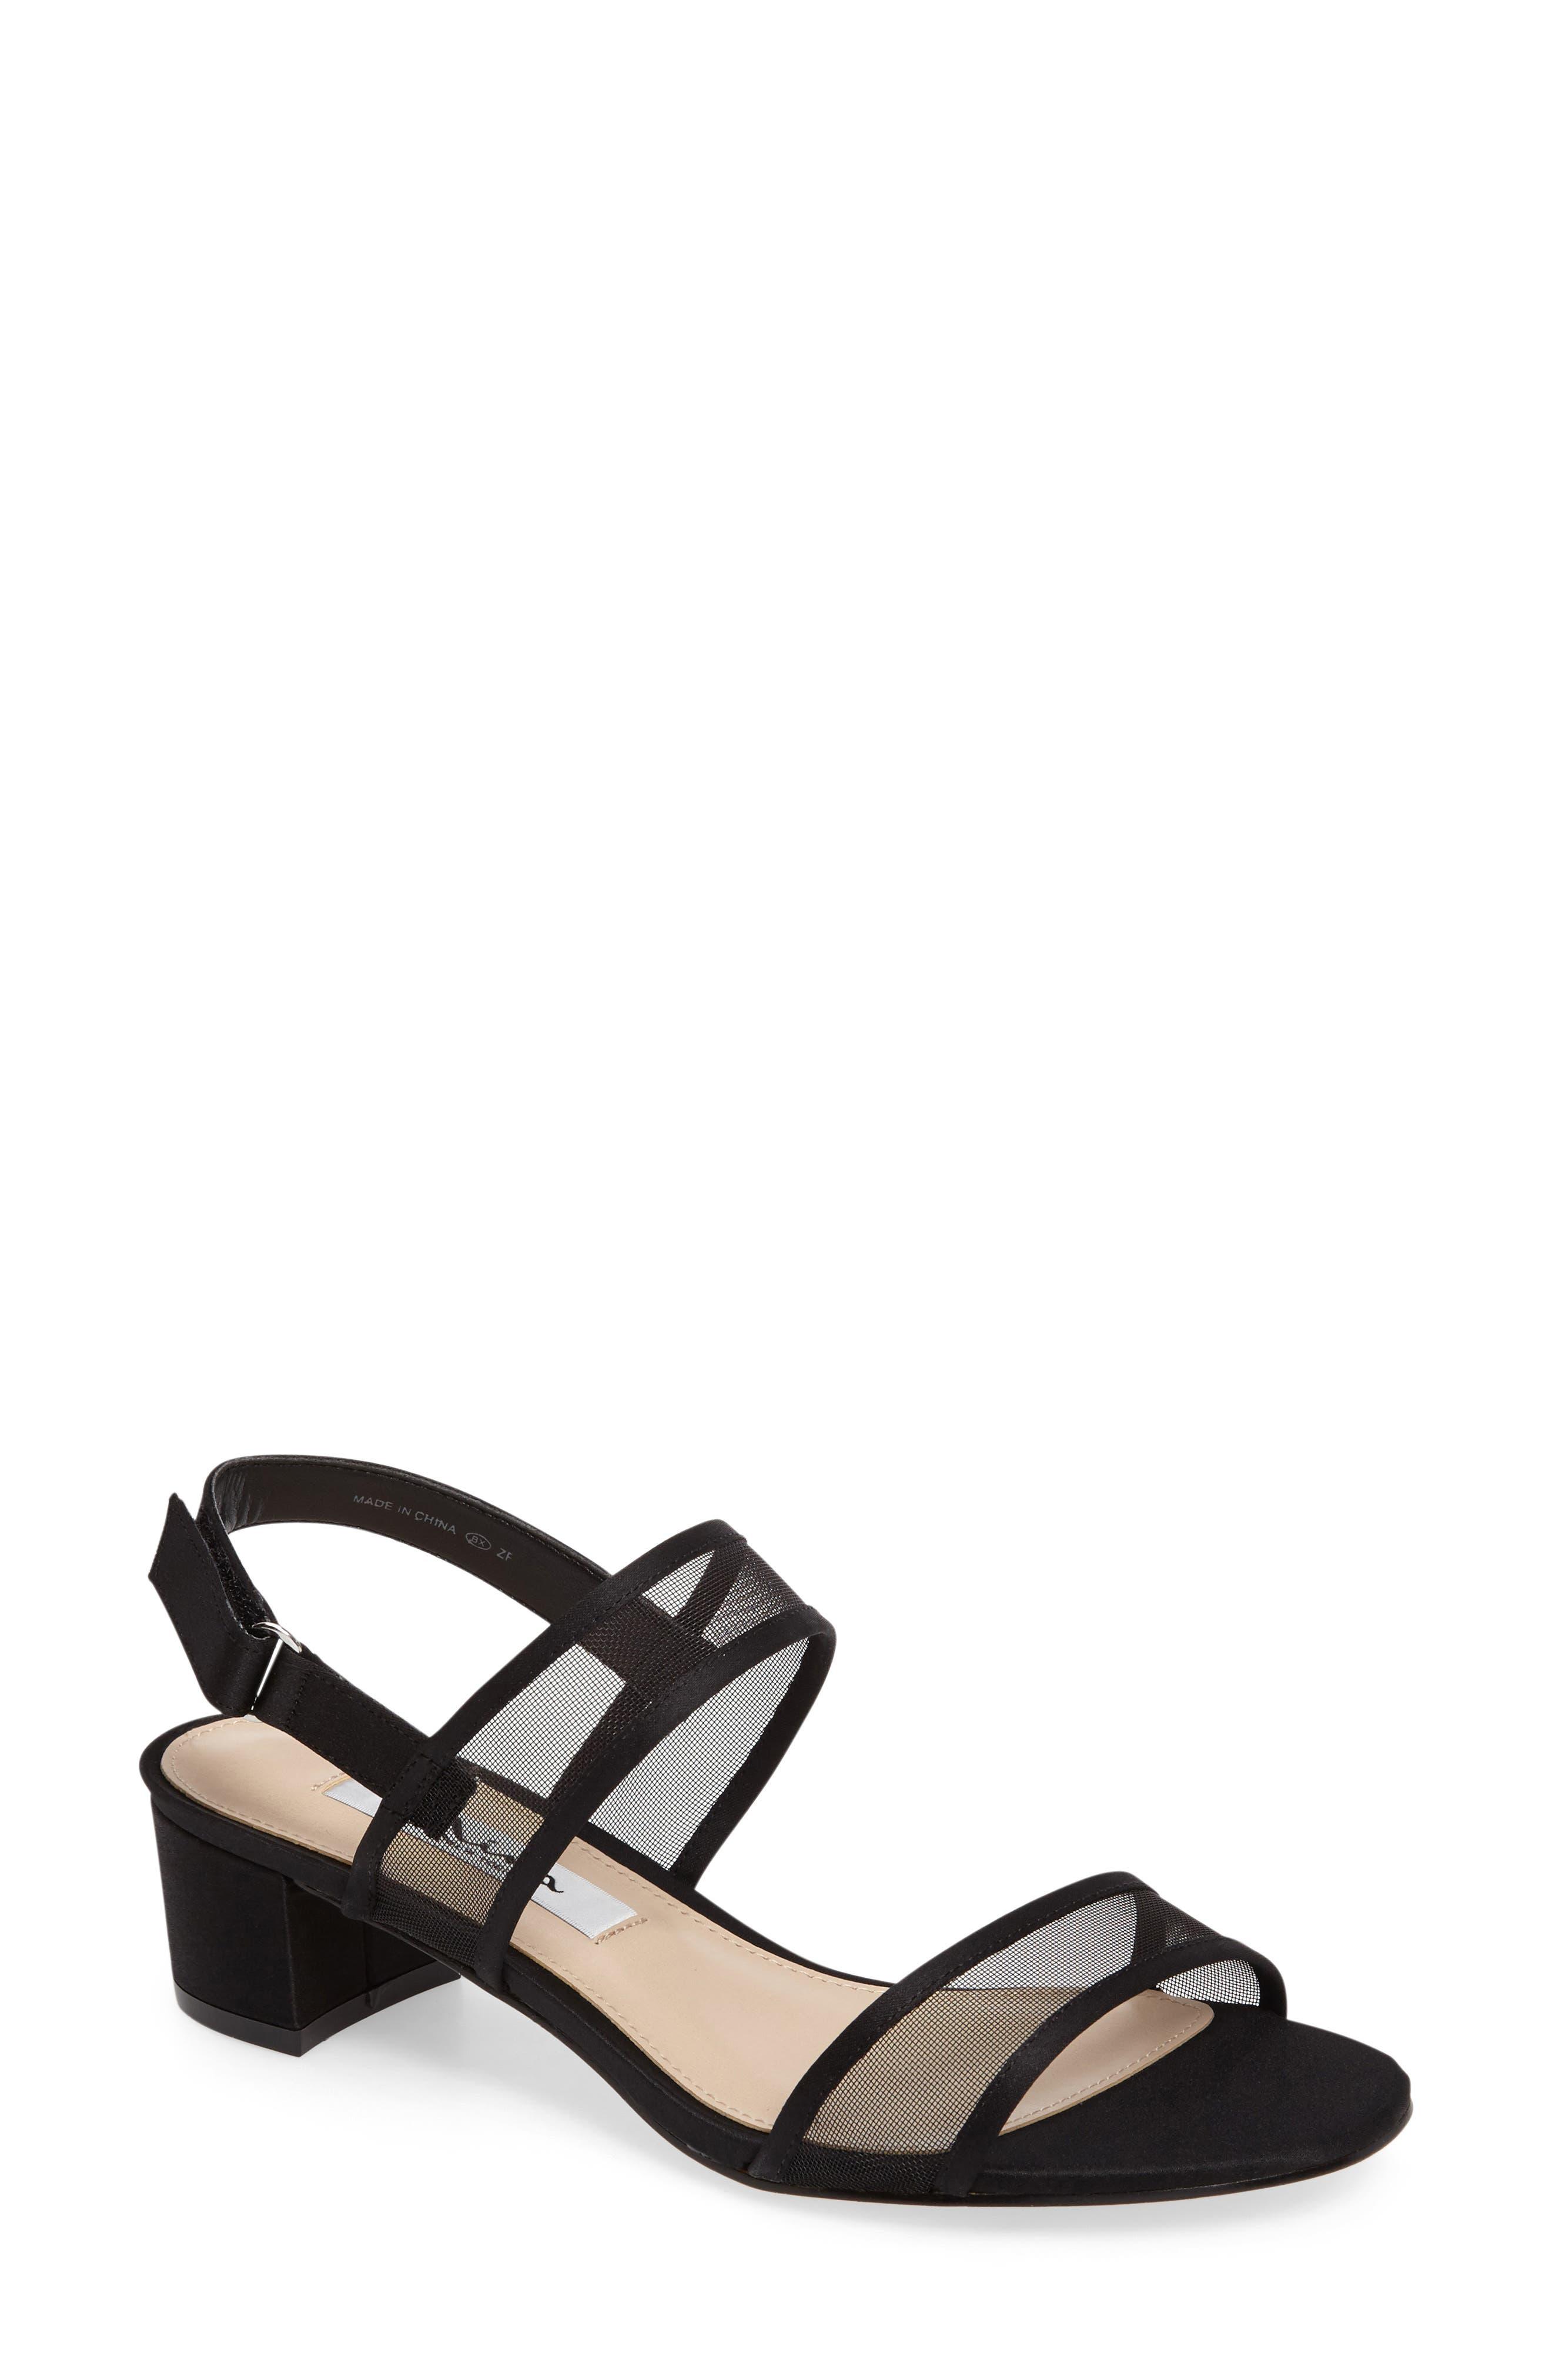 Ganice Mesh Strap Sandal,                         Main,                         color, BLACK SATIN